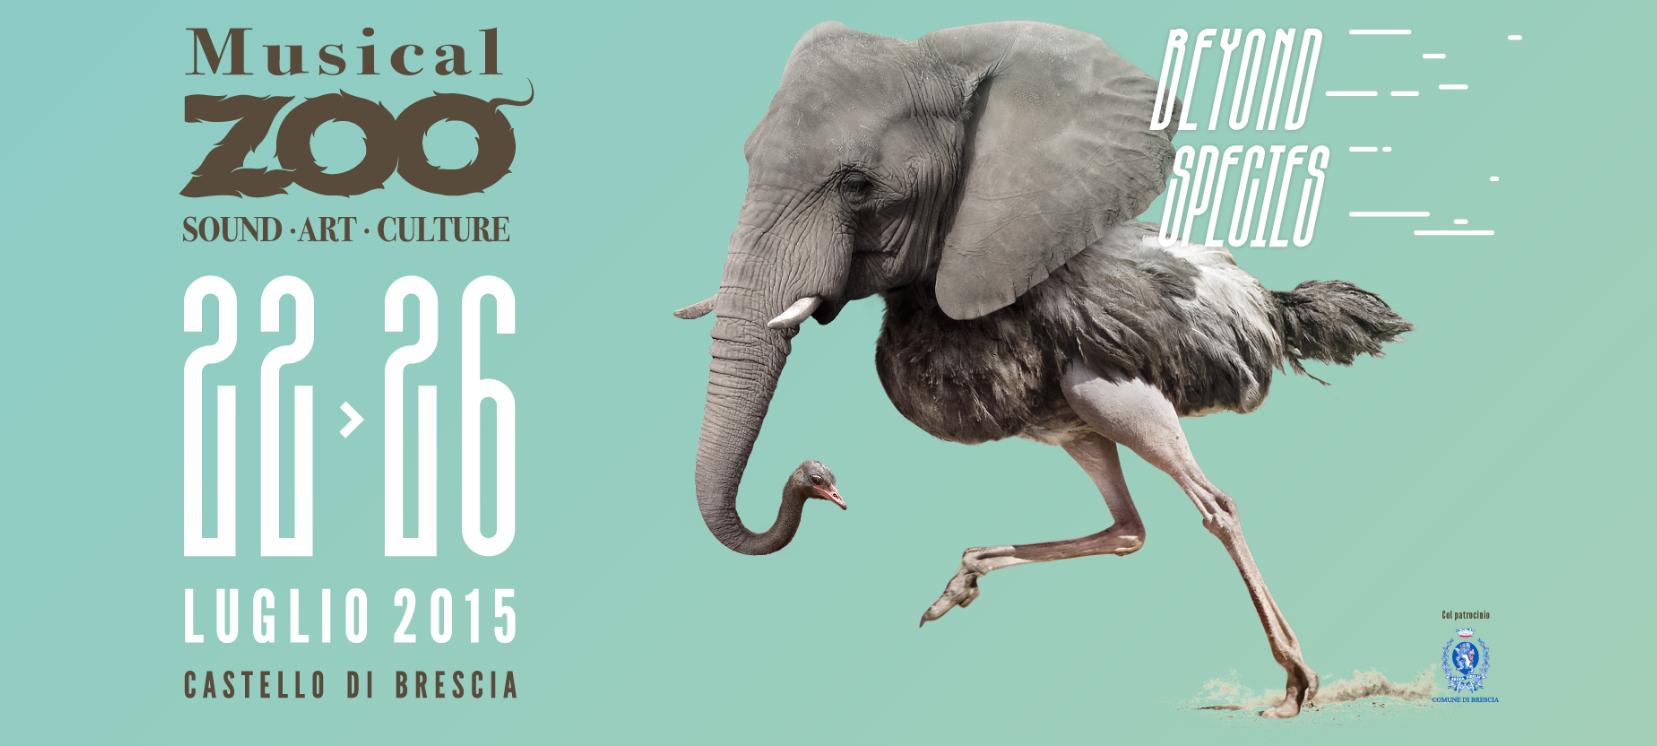 musica-zoo